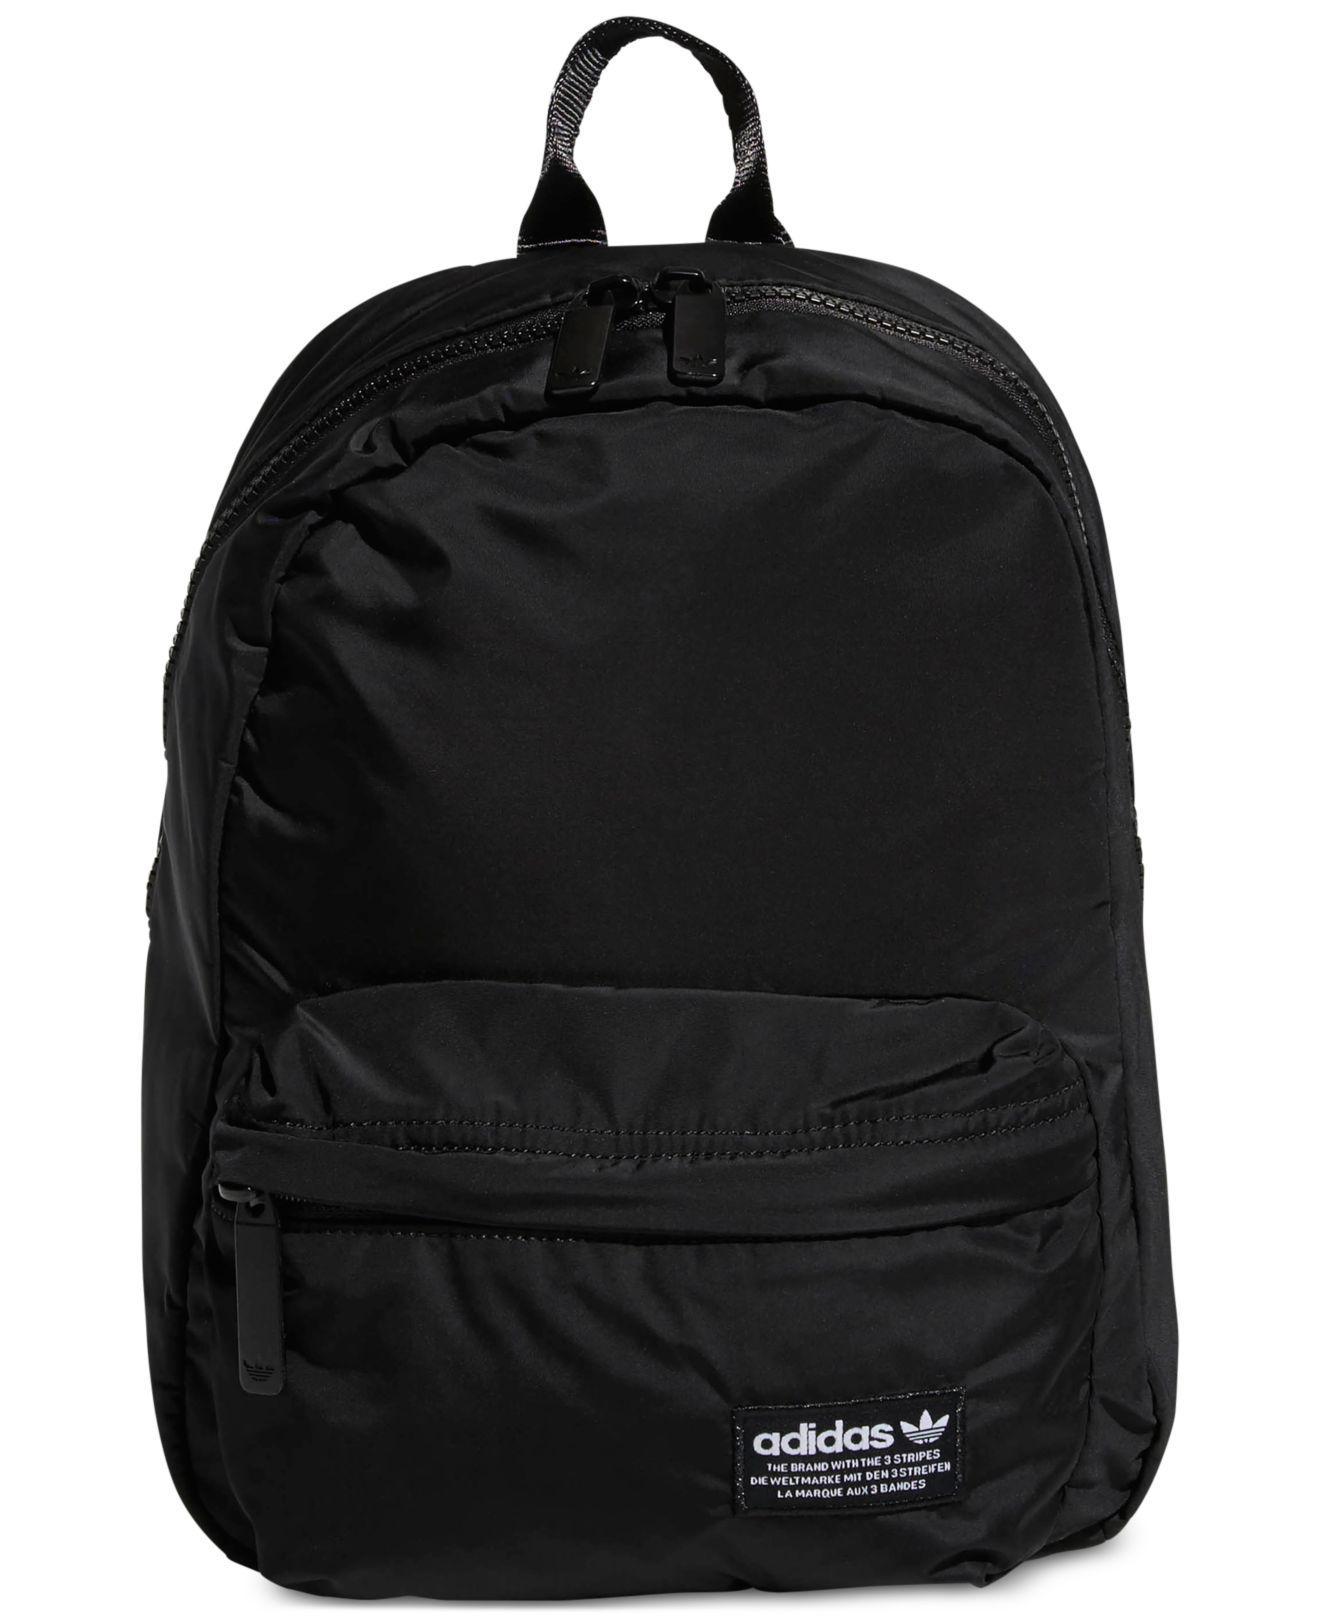 4953d979ce7c ... Adidas - Black Originals National Compact Backpack - Lyst. View  fullscreen sale retailer 26651 c3144 . ...